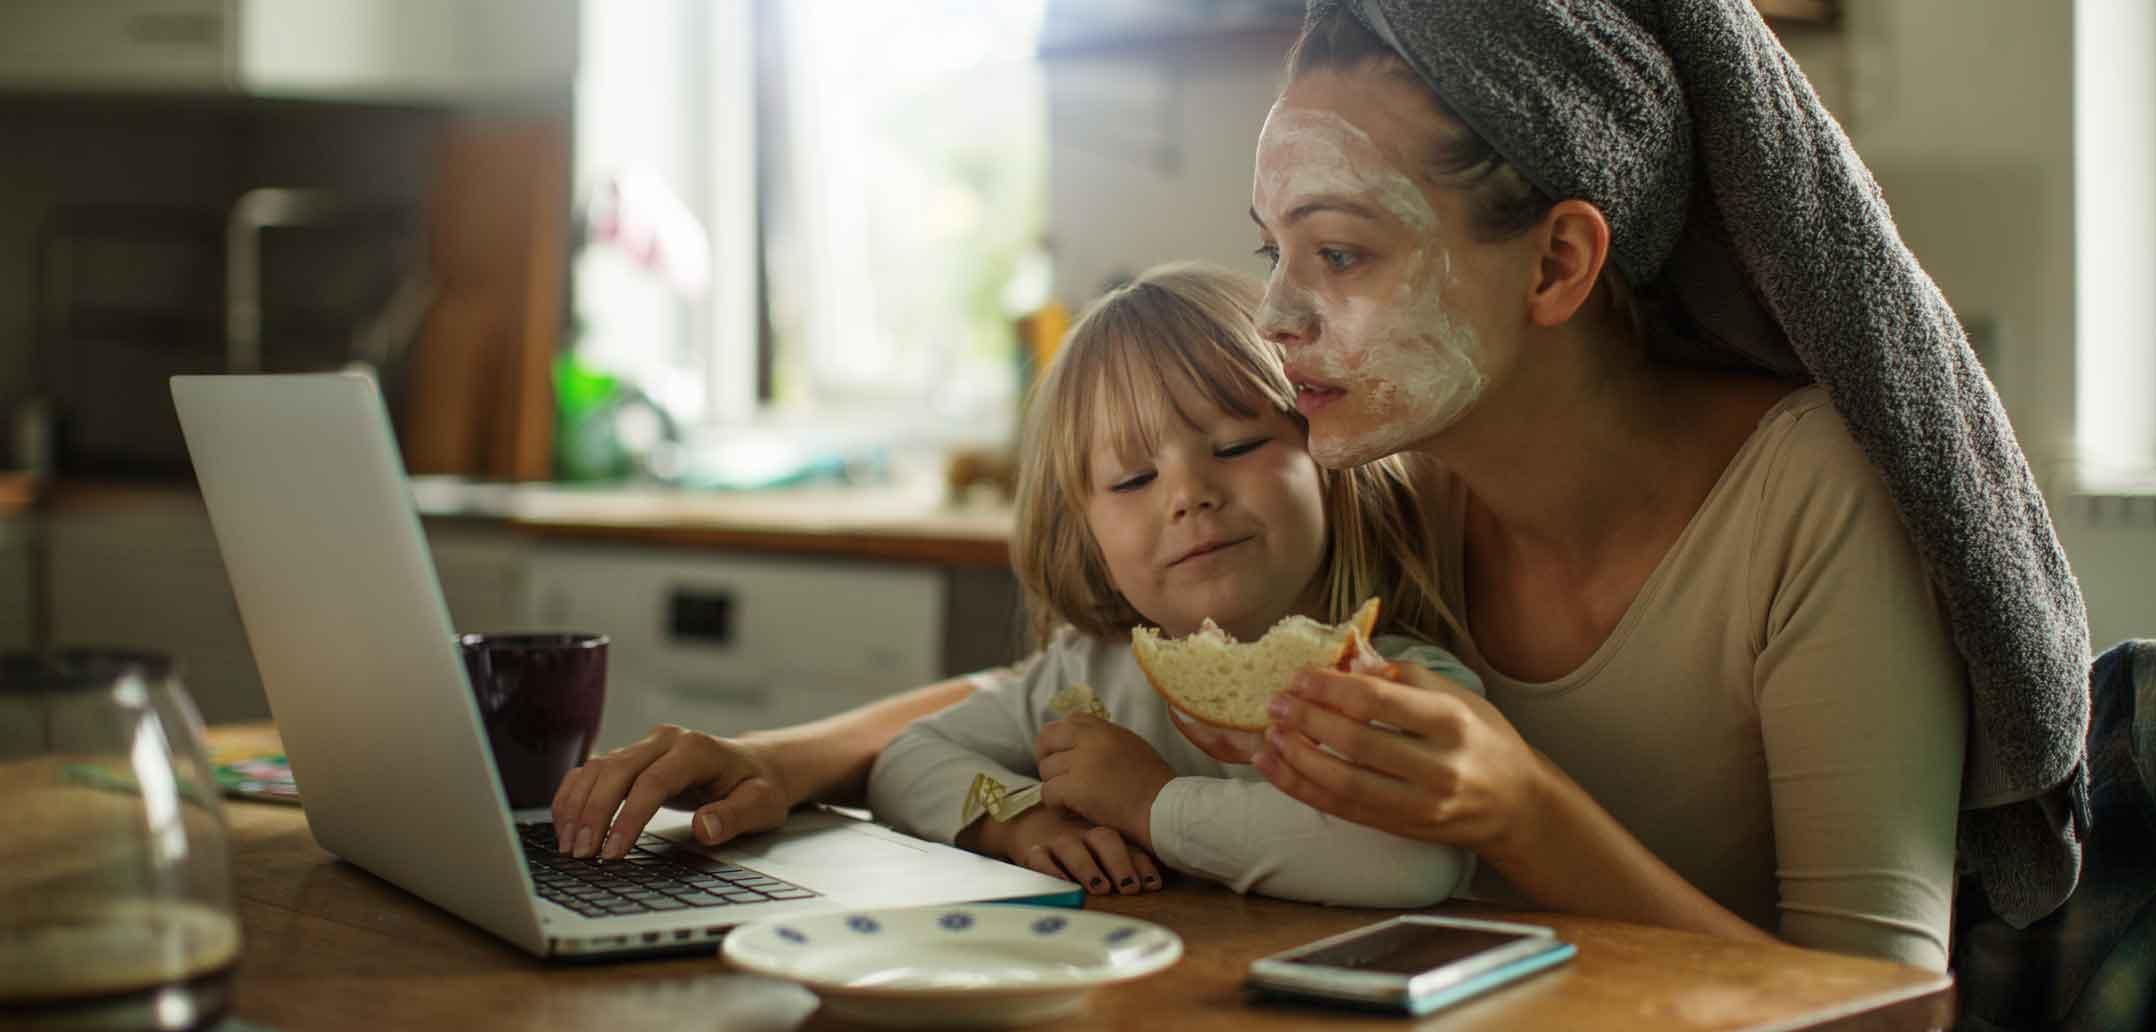 Hohe Ansprüche an Mütter